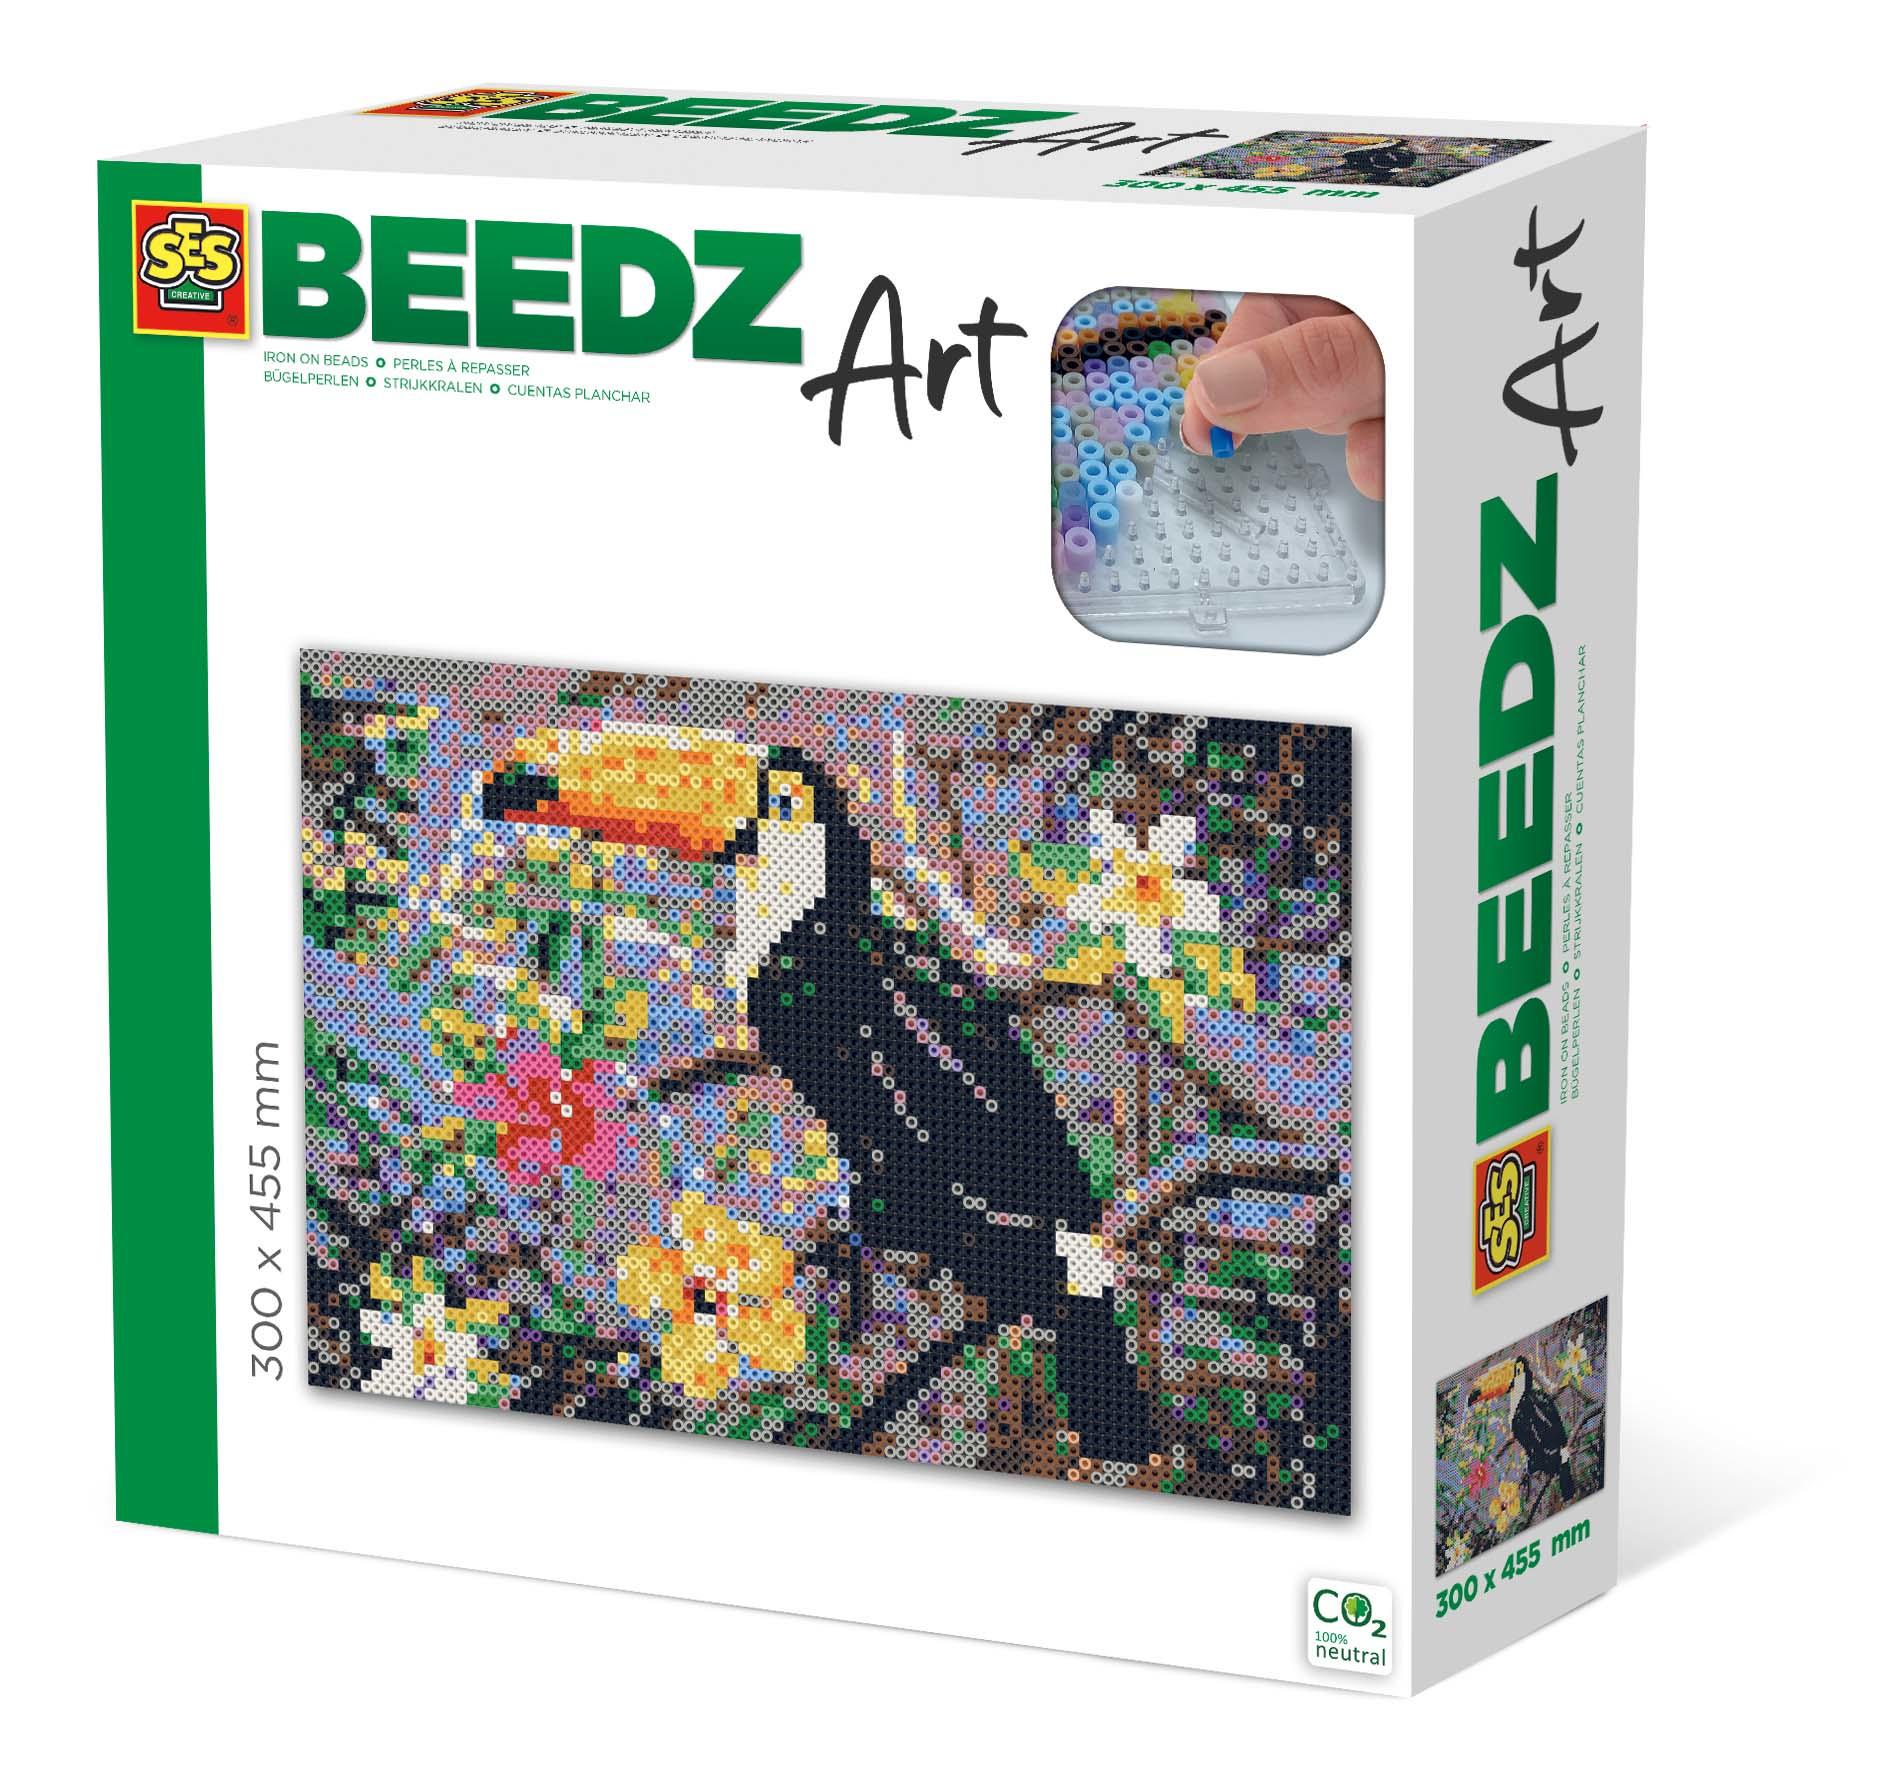 SES Creative Beedz art - Toucan